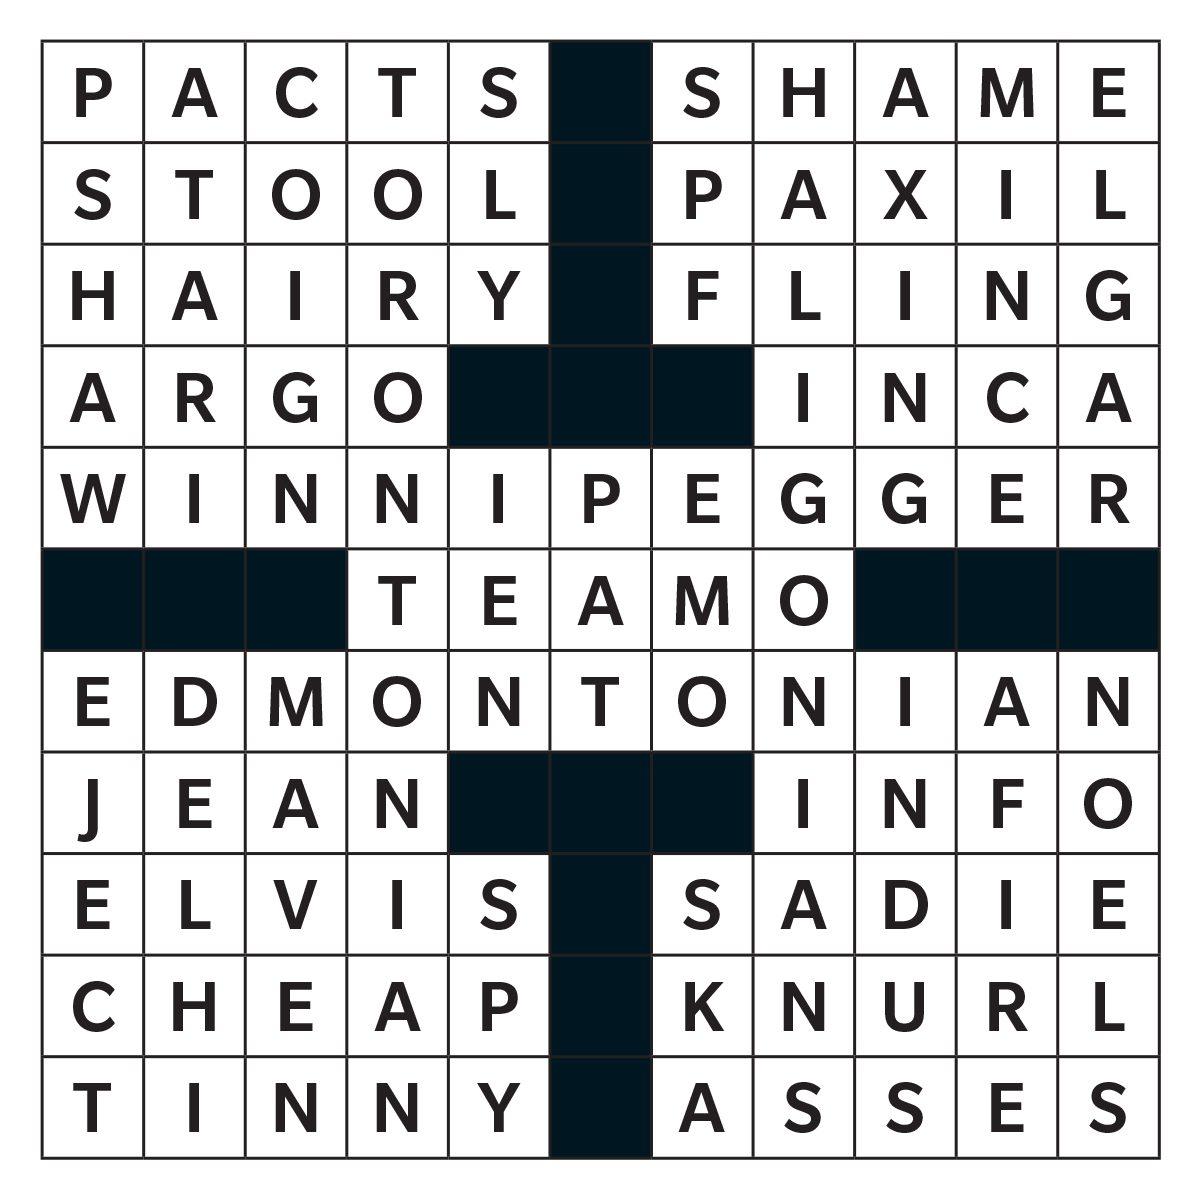 Printable Crossword Answer - April 2019